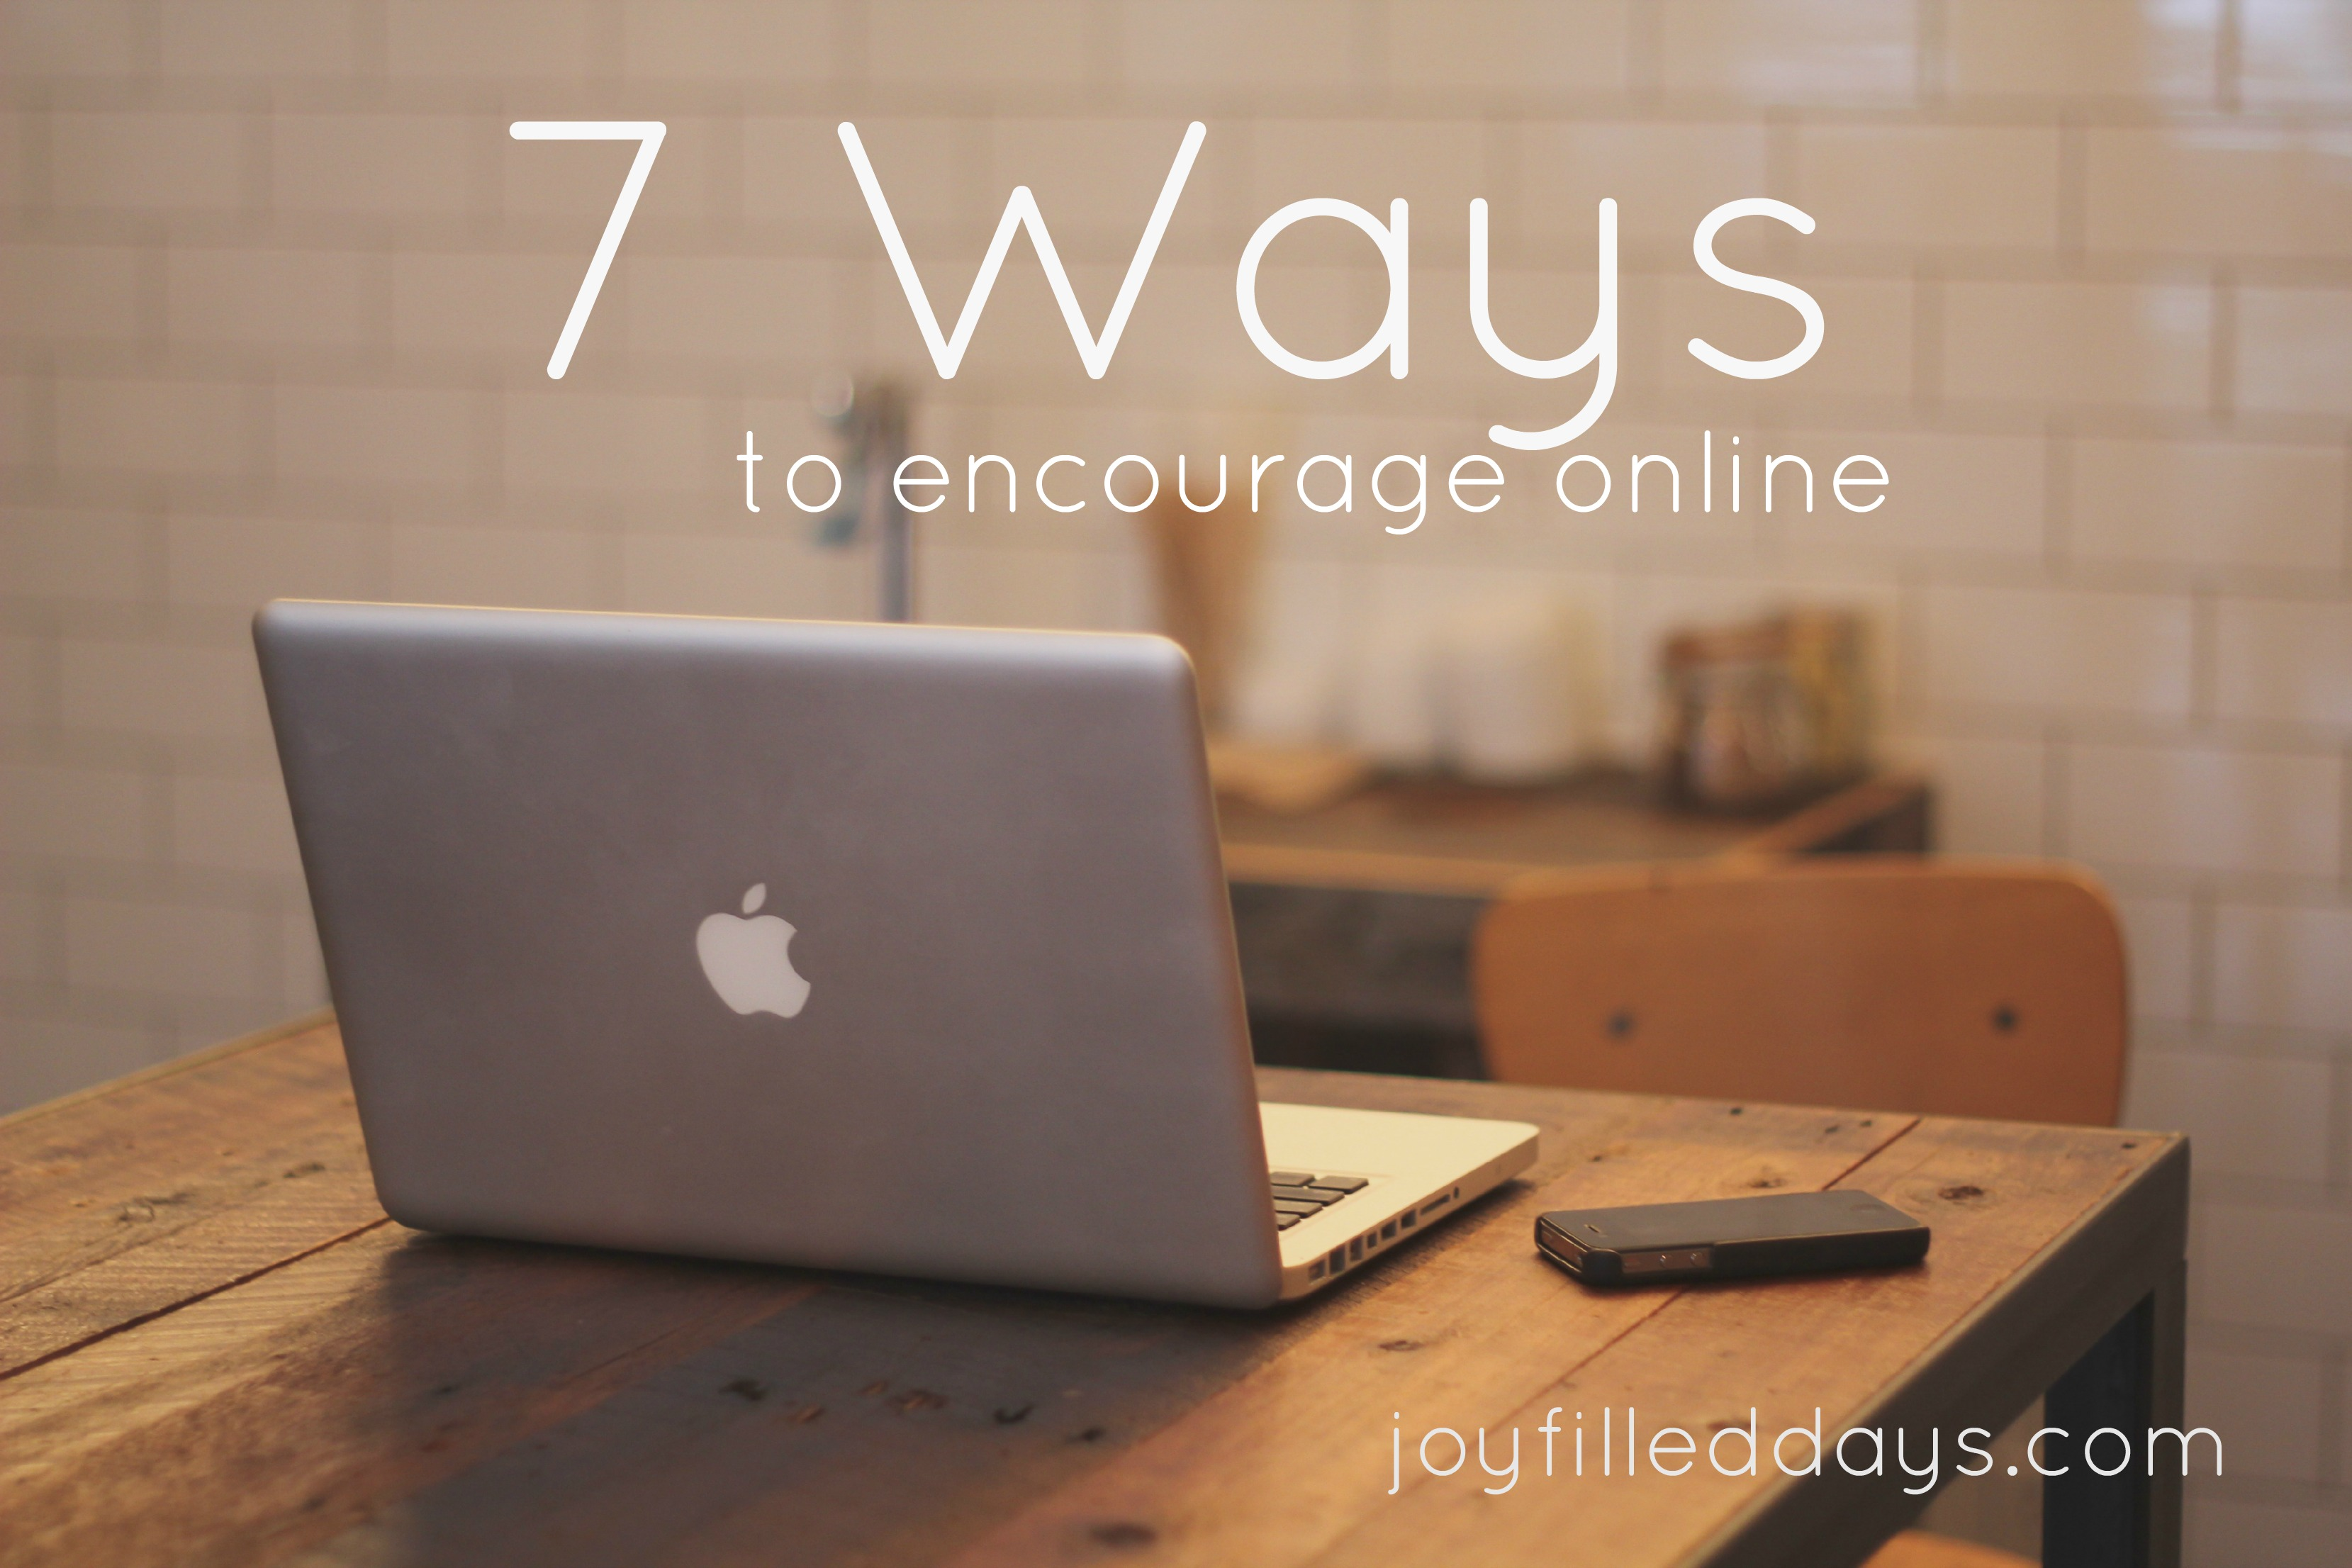 7 Ways to Encourage Online